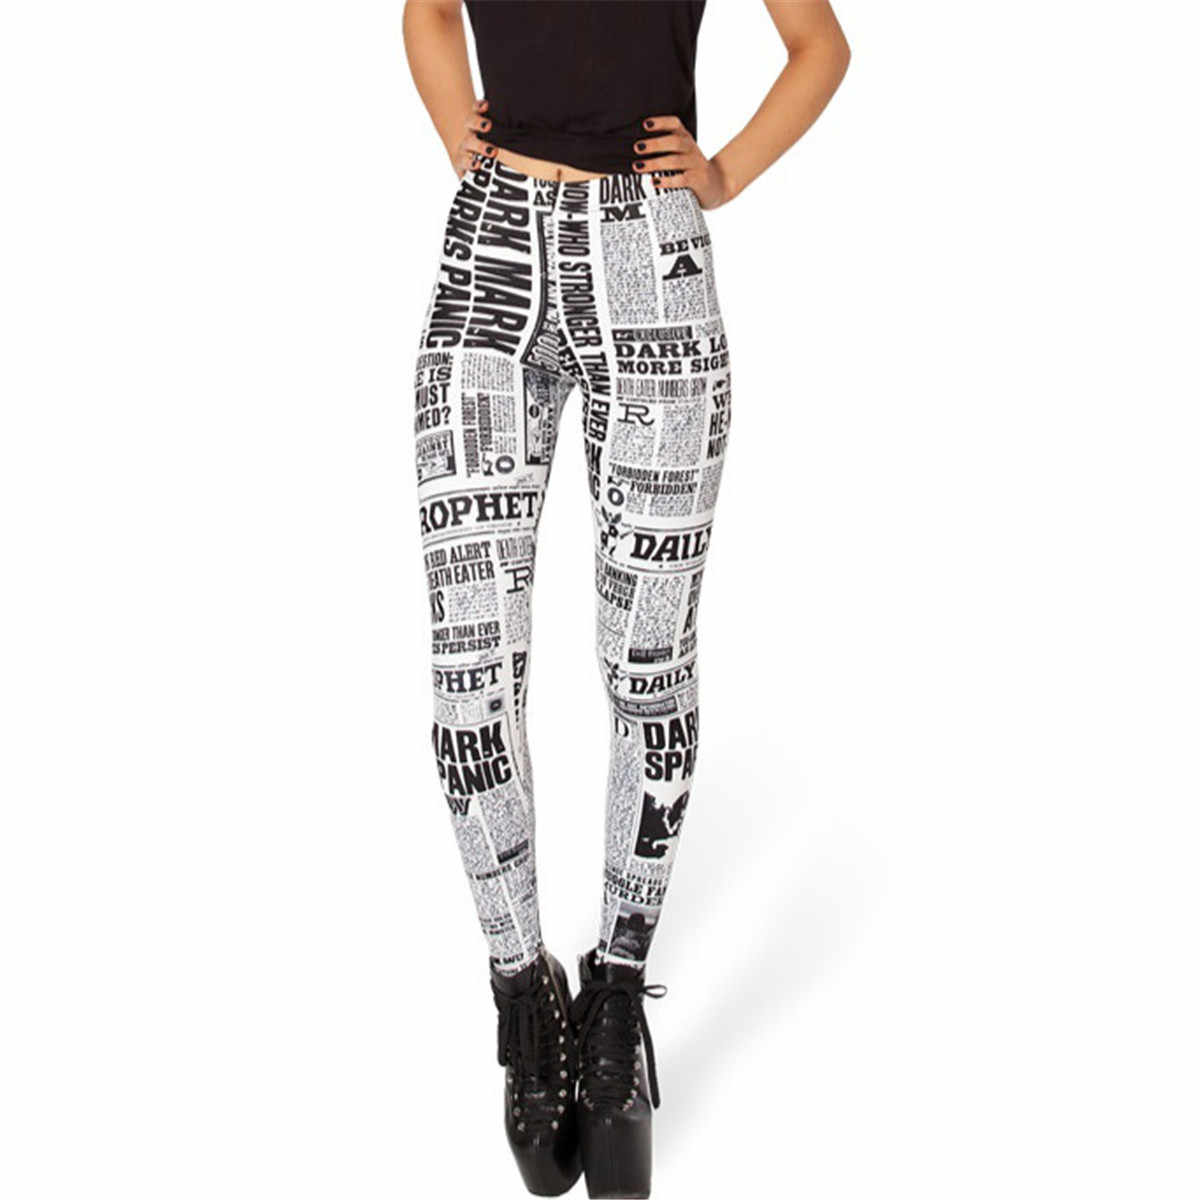 009add16c9e17 ... Skull Leggings Women Tattoo Pants Newspaper Fitness Workout 3D Print  Sportswear Sexy Women Pants New Leggings ...